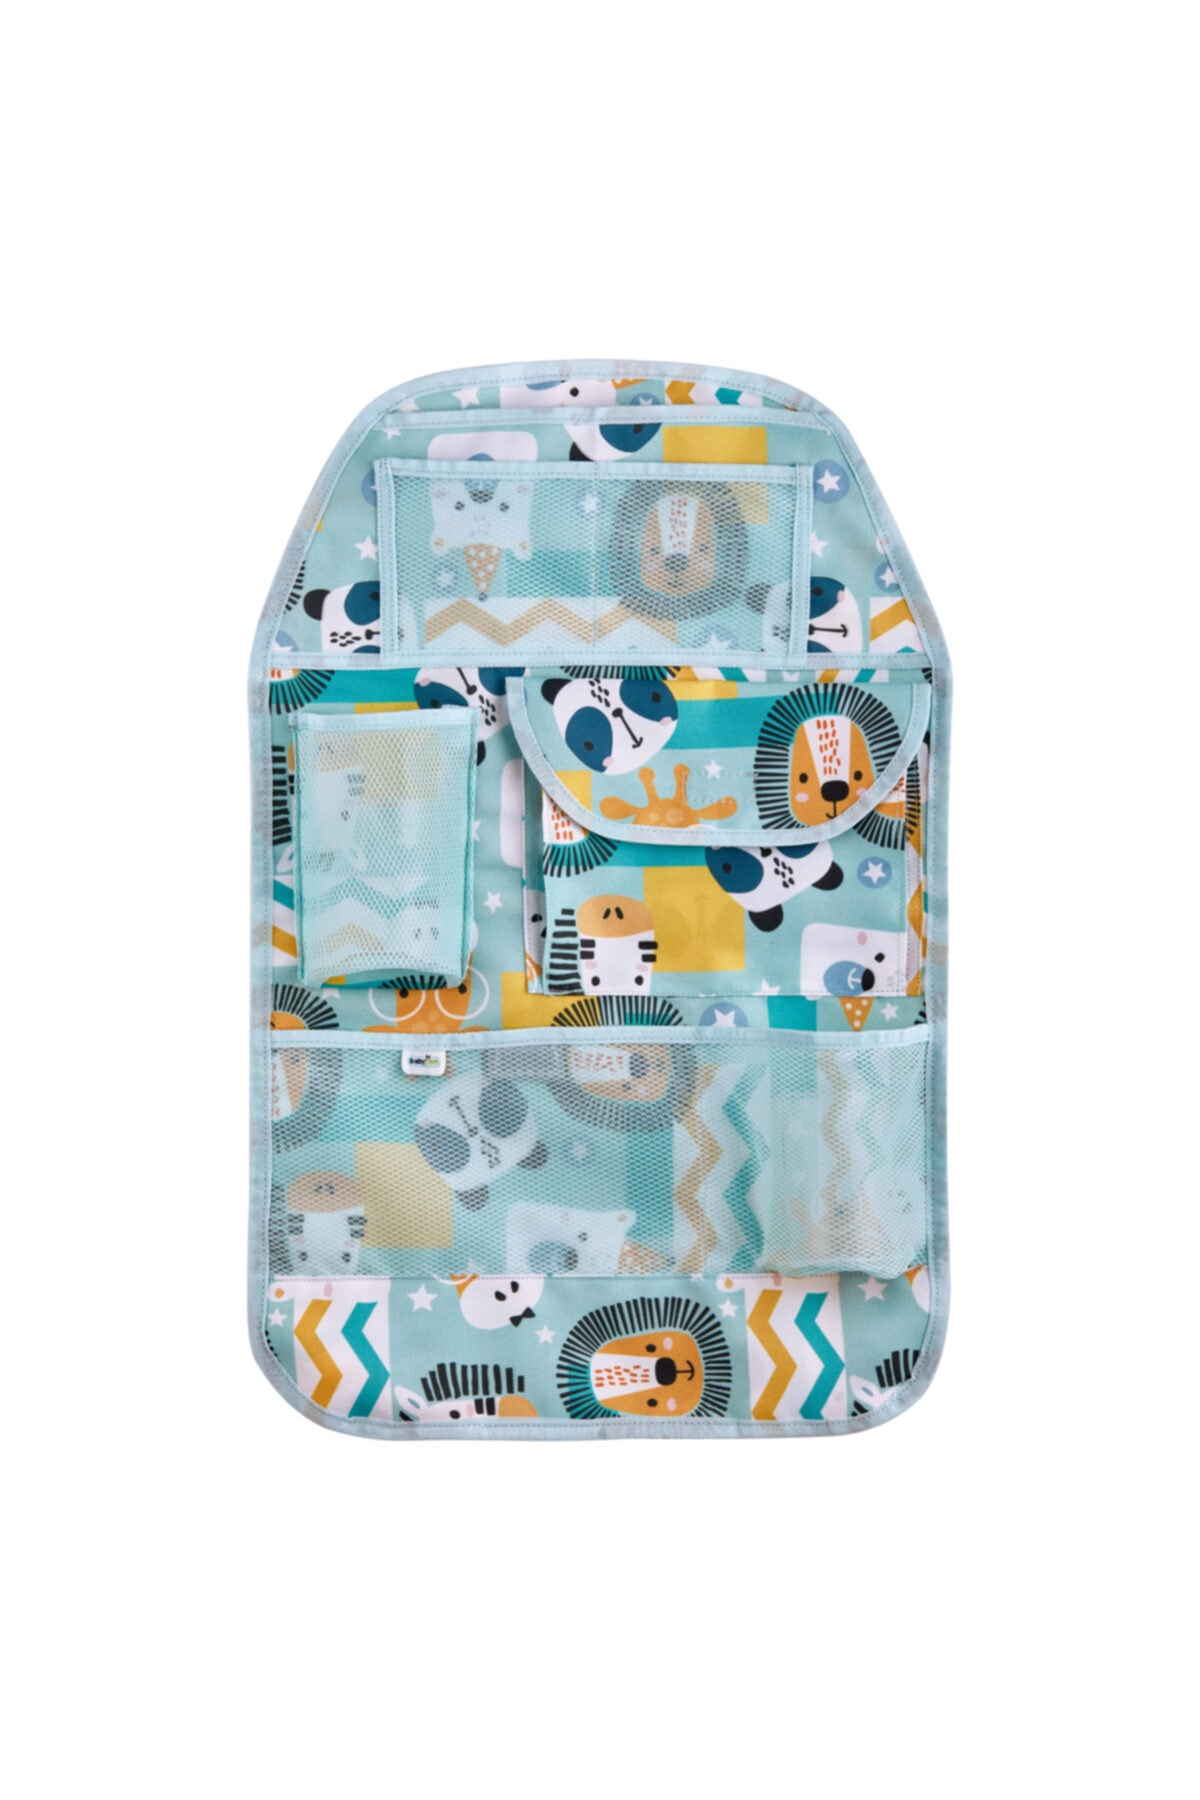 Car Back Seat Organizer For Kids Children Baby Blue Pattern